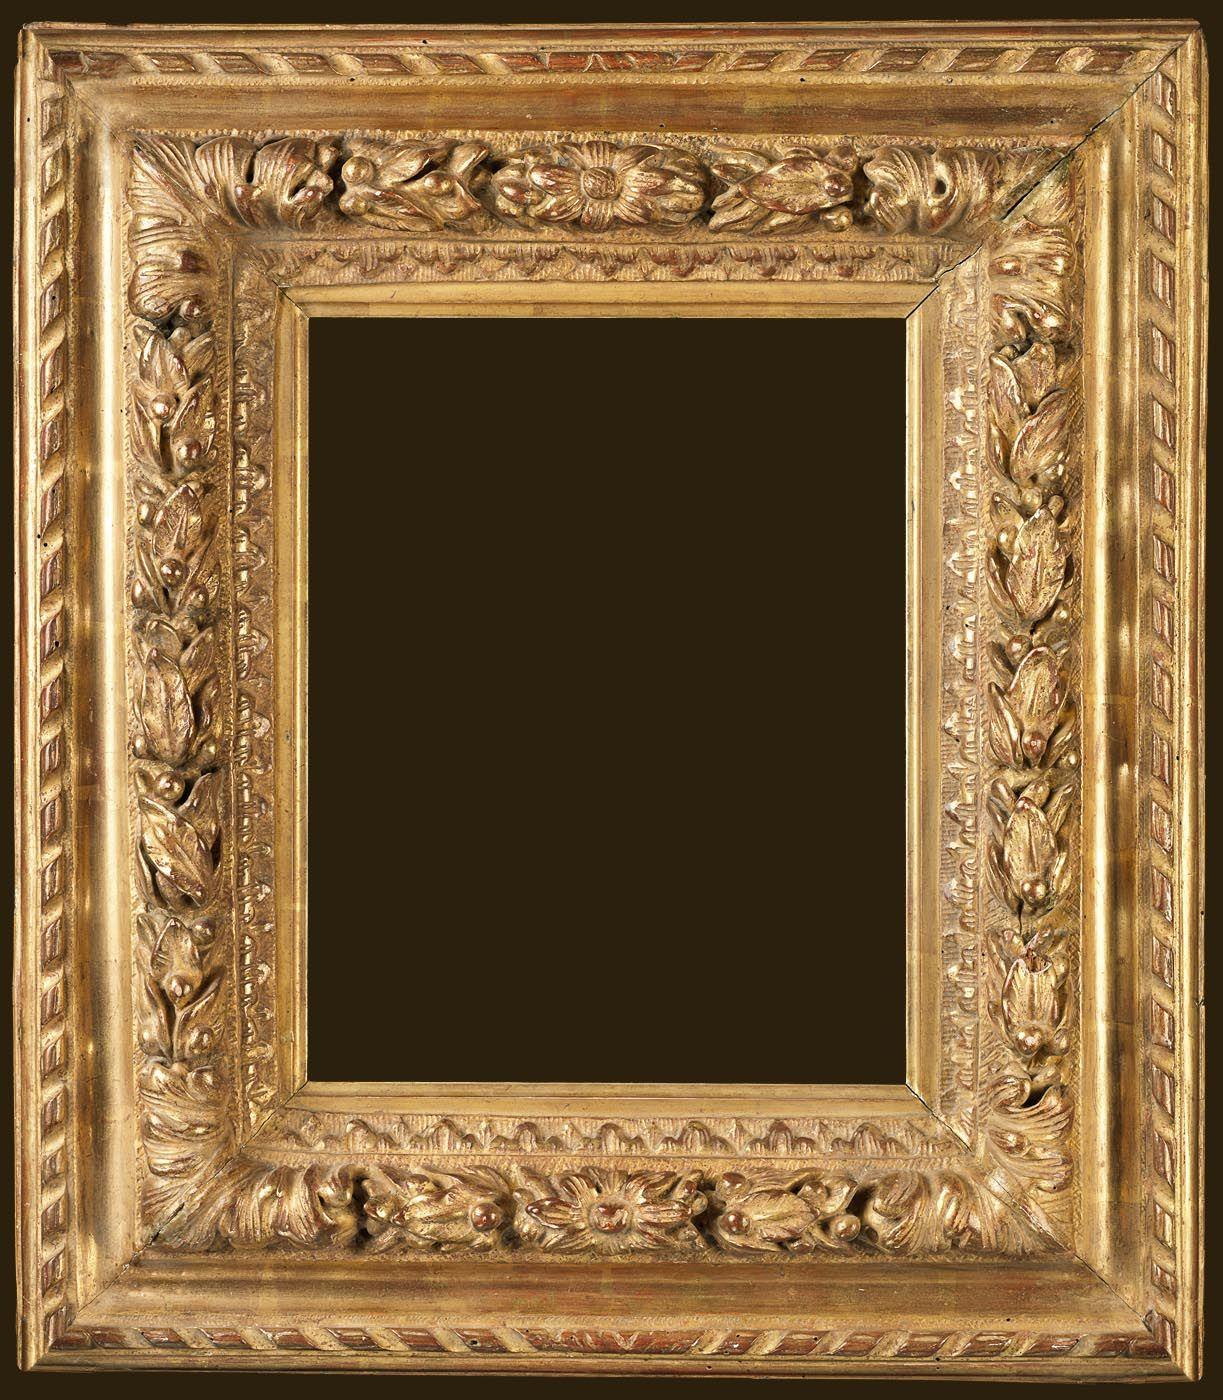 Louis Xiii 19th Century 14 3 4 X 11 1 2 X 5 Antique Picture Frames Antique Frames Painting Frames